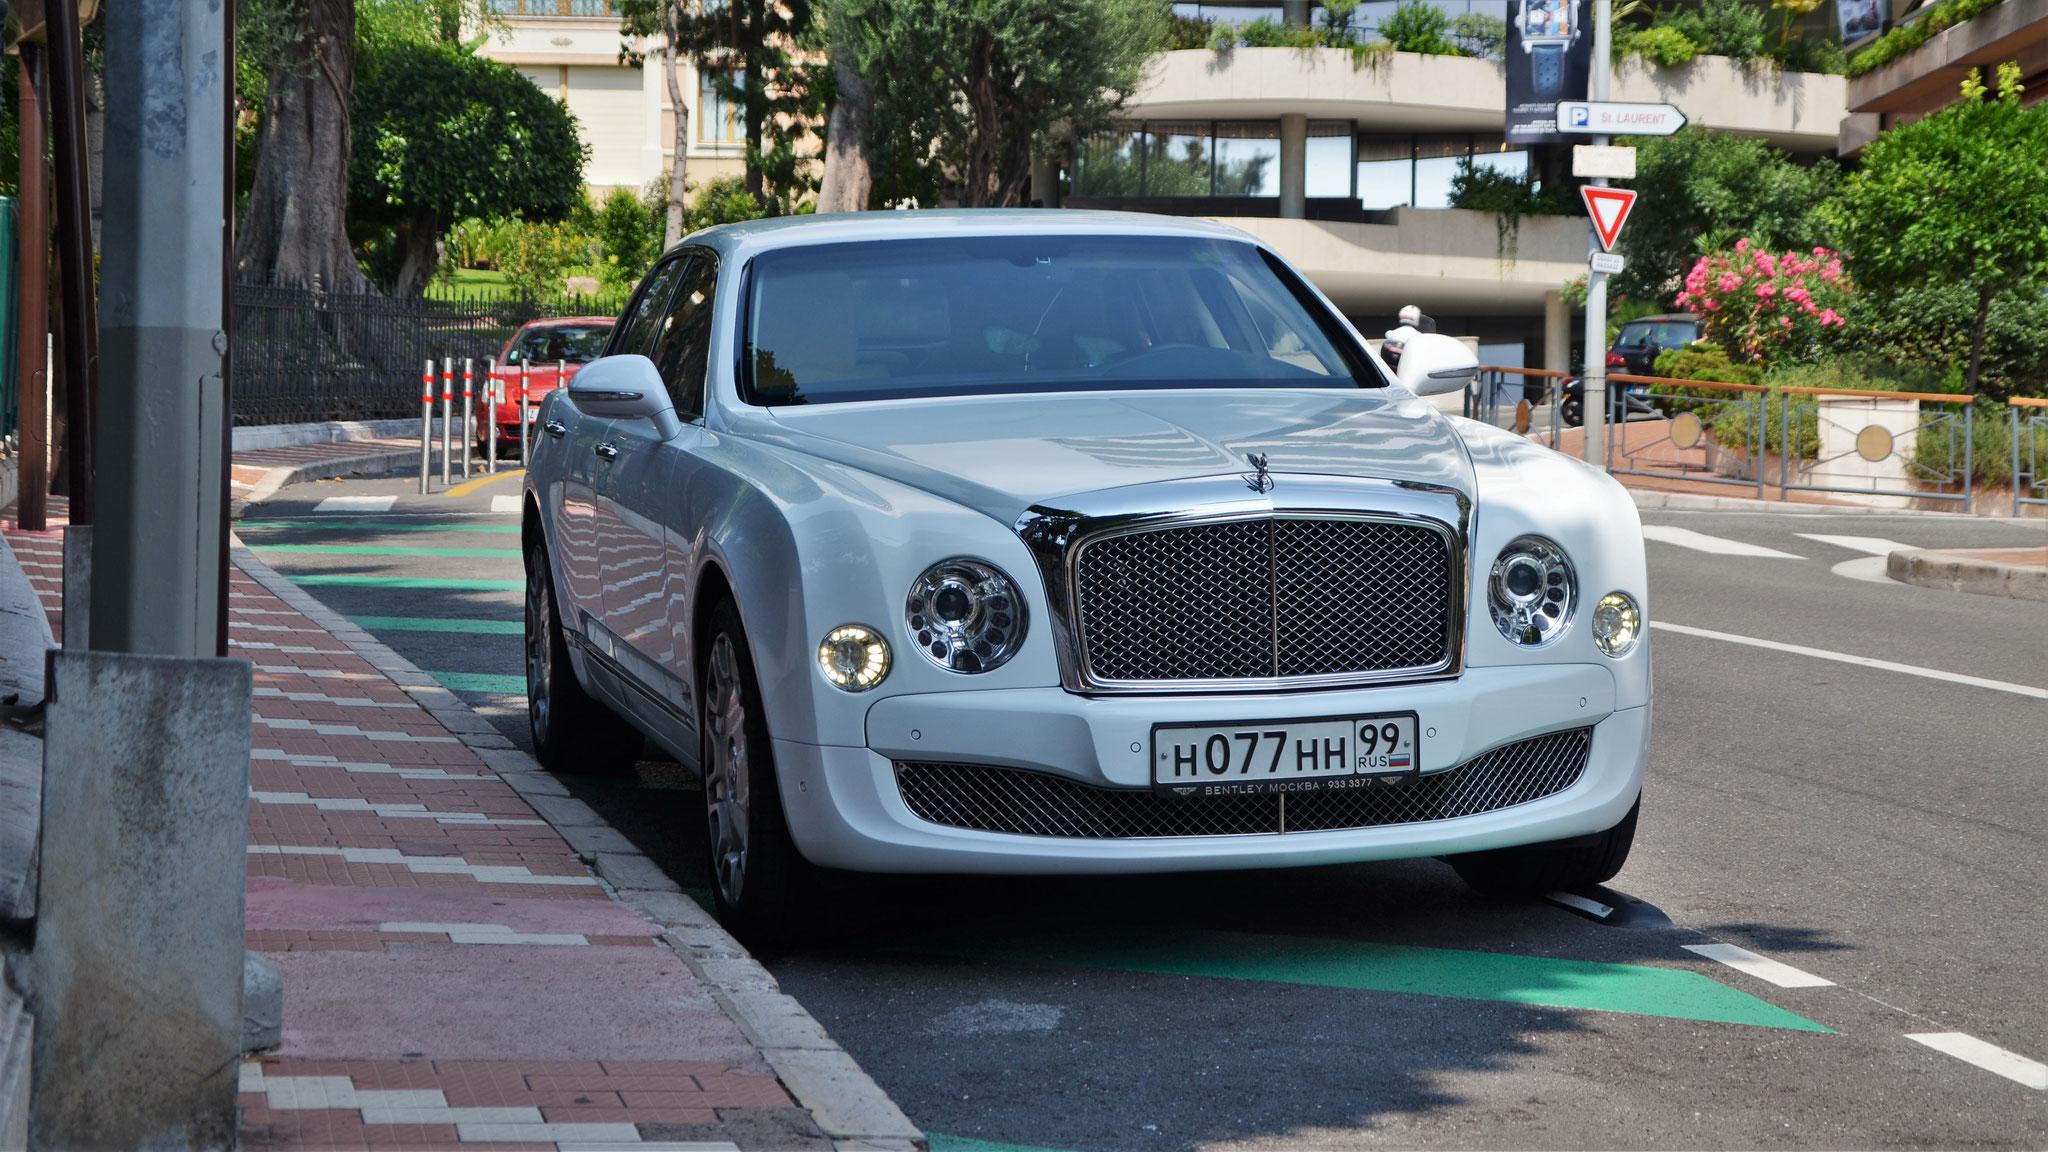 Bentley Mulsanne - H-077-HH-99 (RUS)